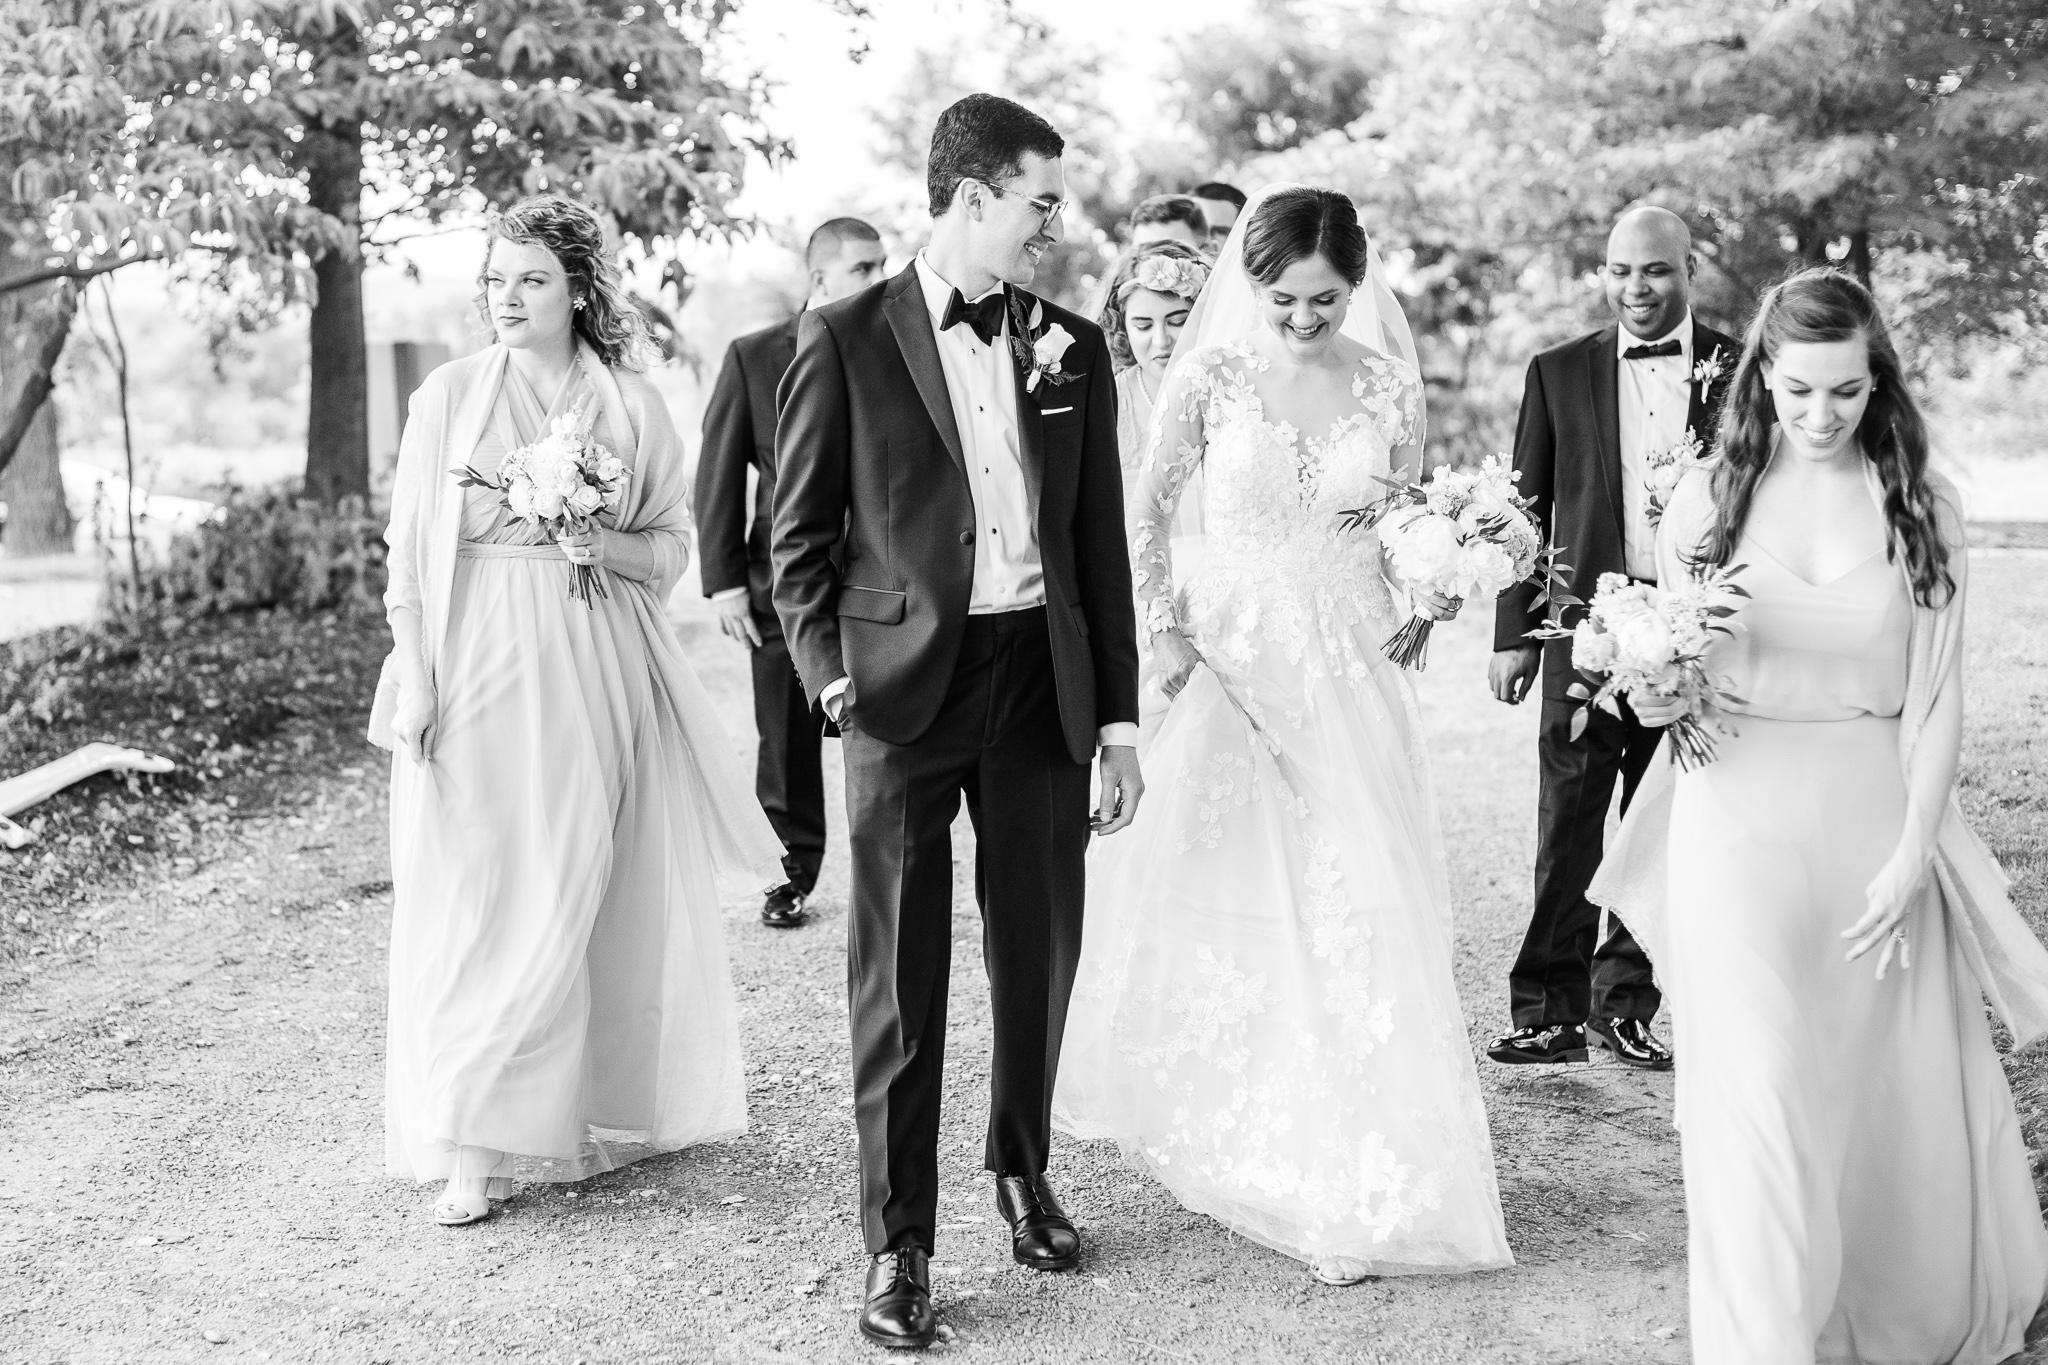 A bridal party walking together to a reception at The Barns at Hamilton Station Vineyard in Leesburg, Northern Virginia